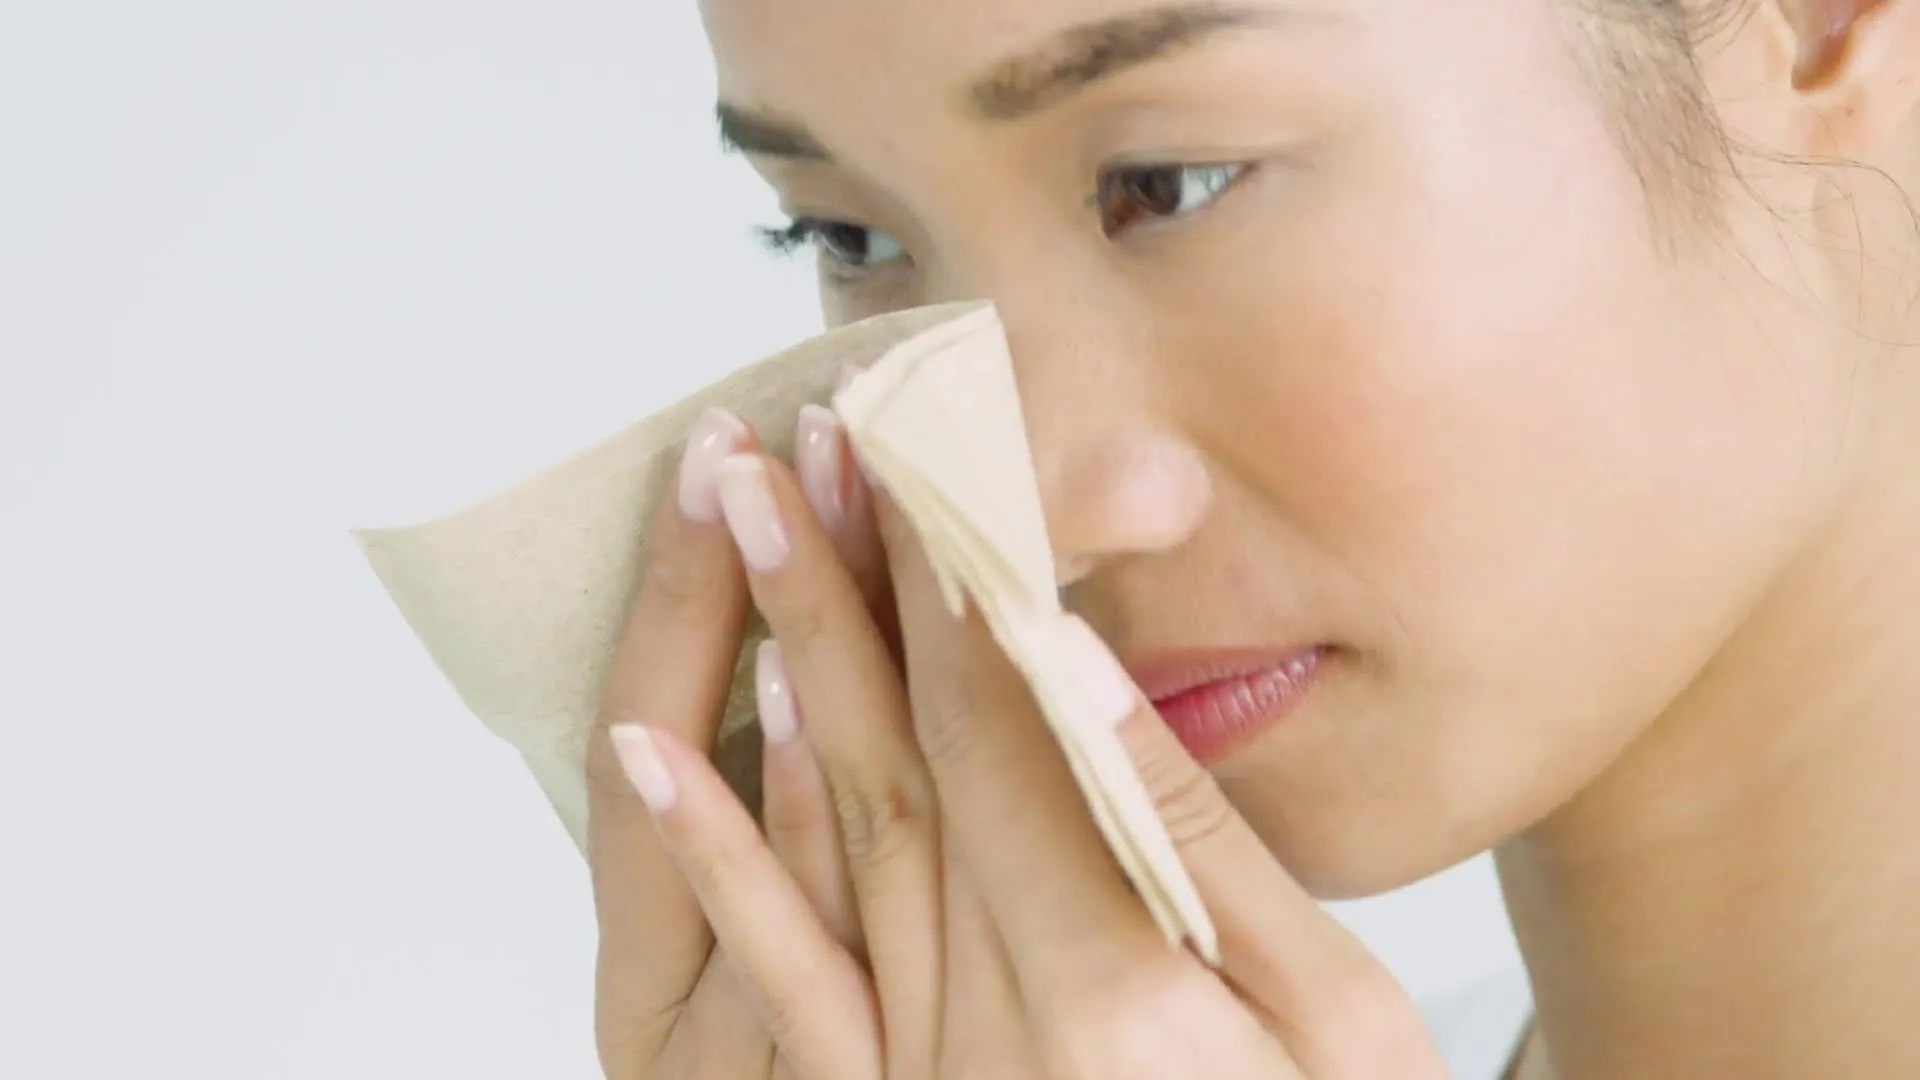 Fresh Skin Care And Aesthetics